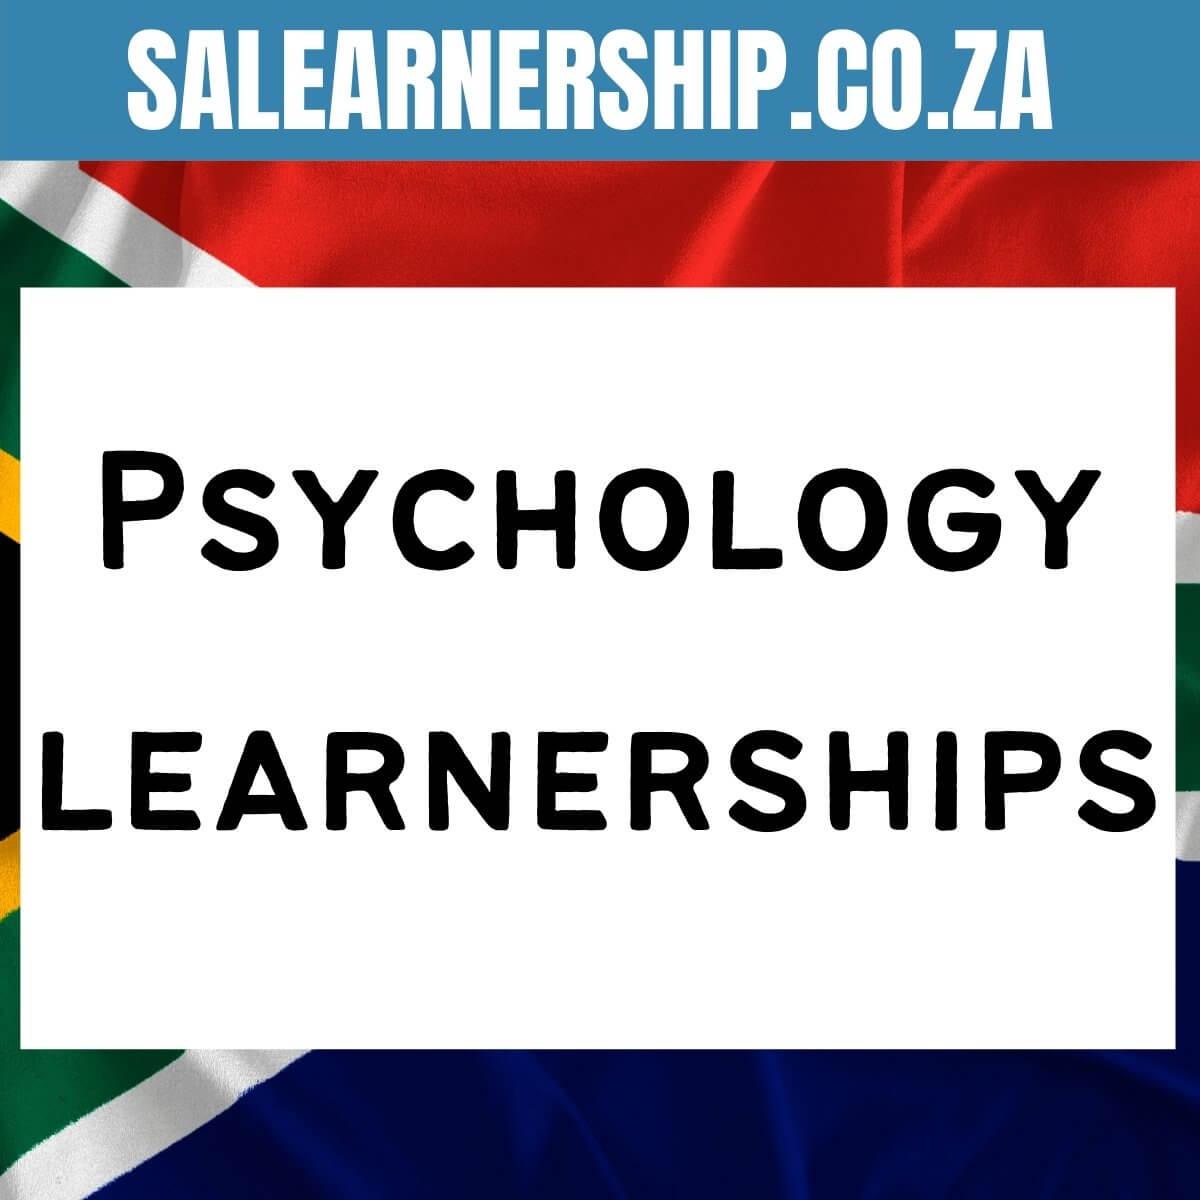 Psychology learnerships